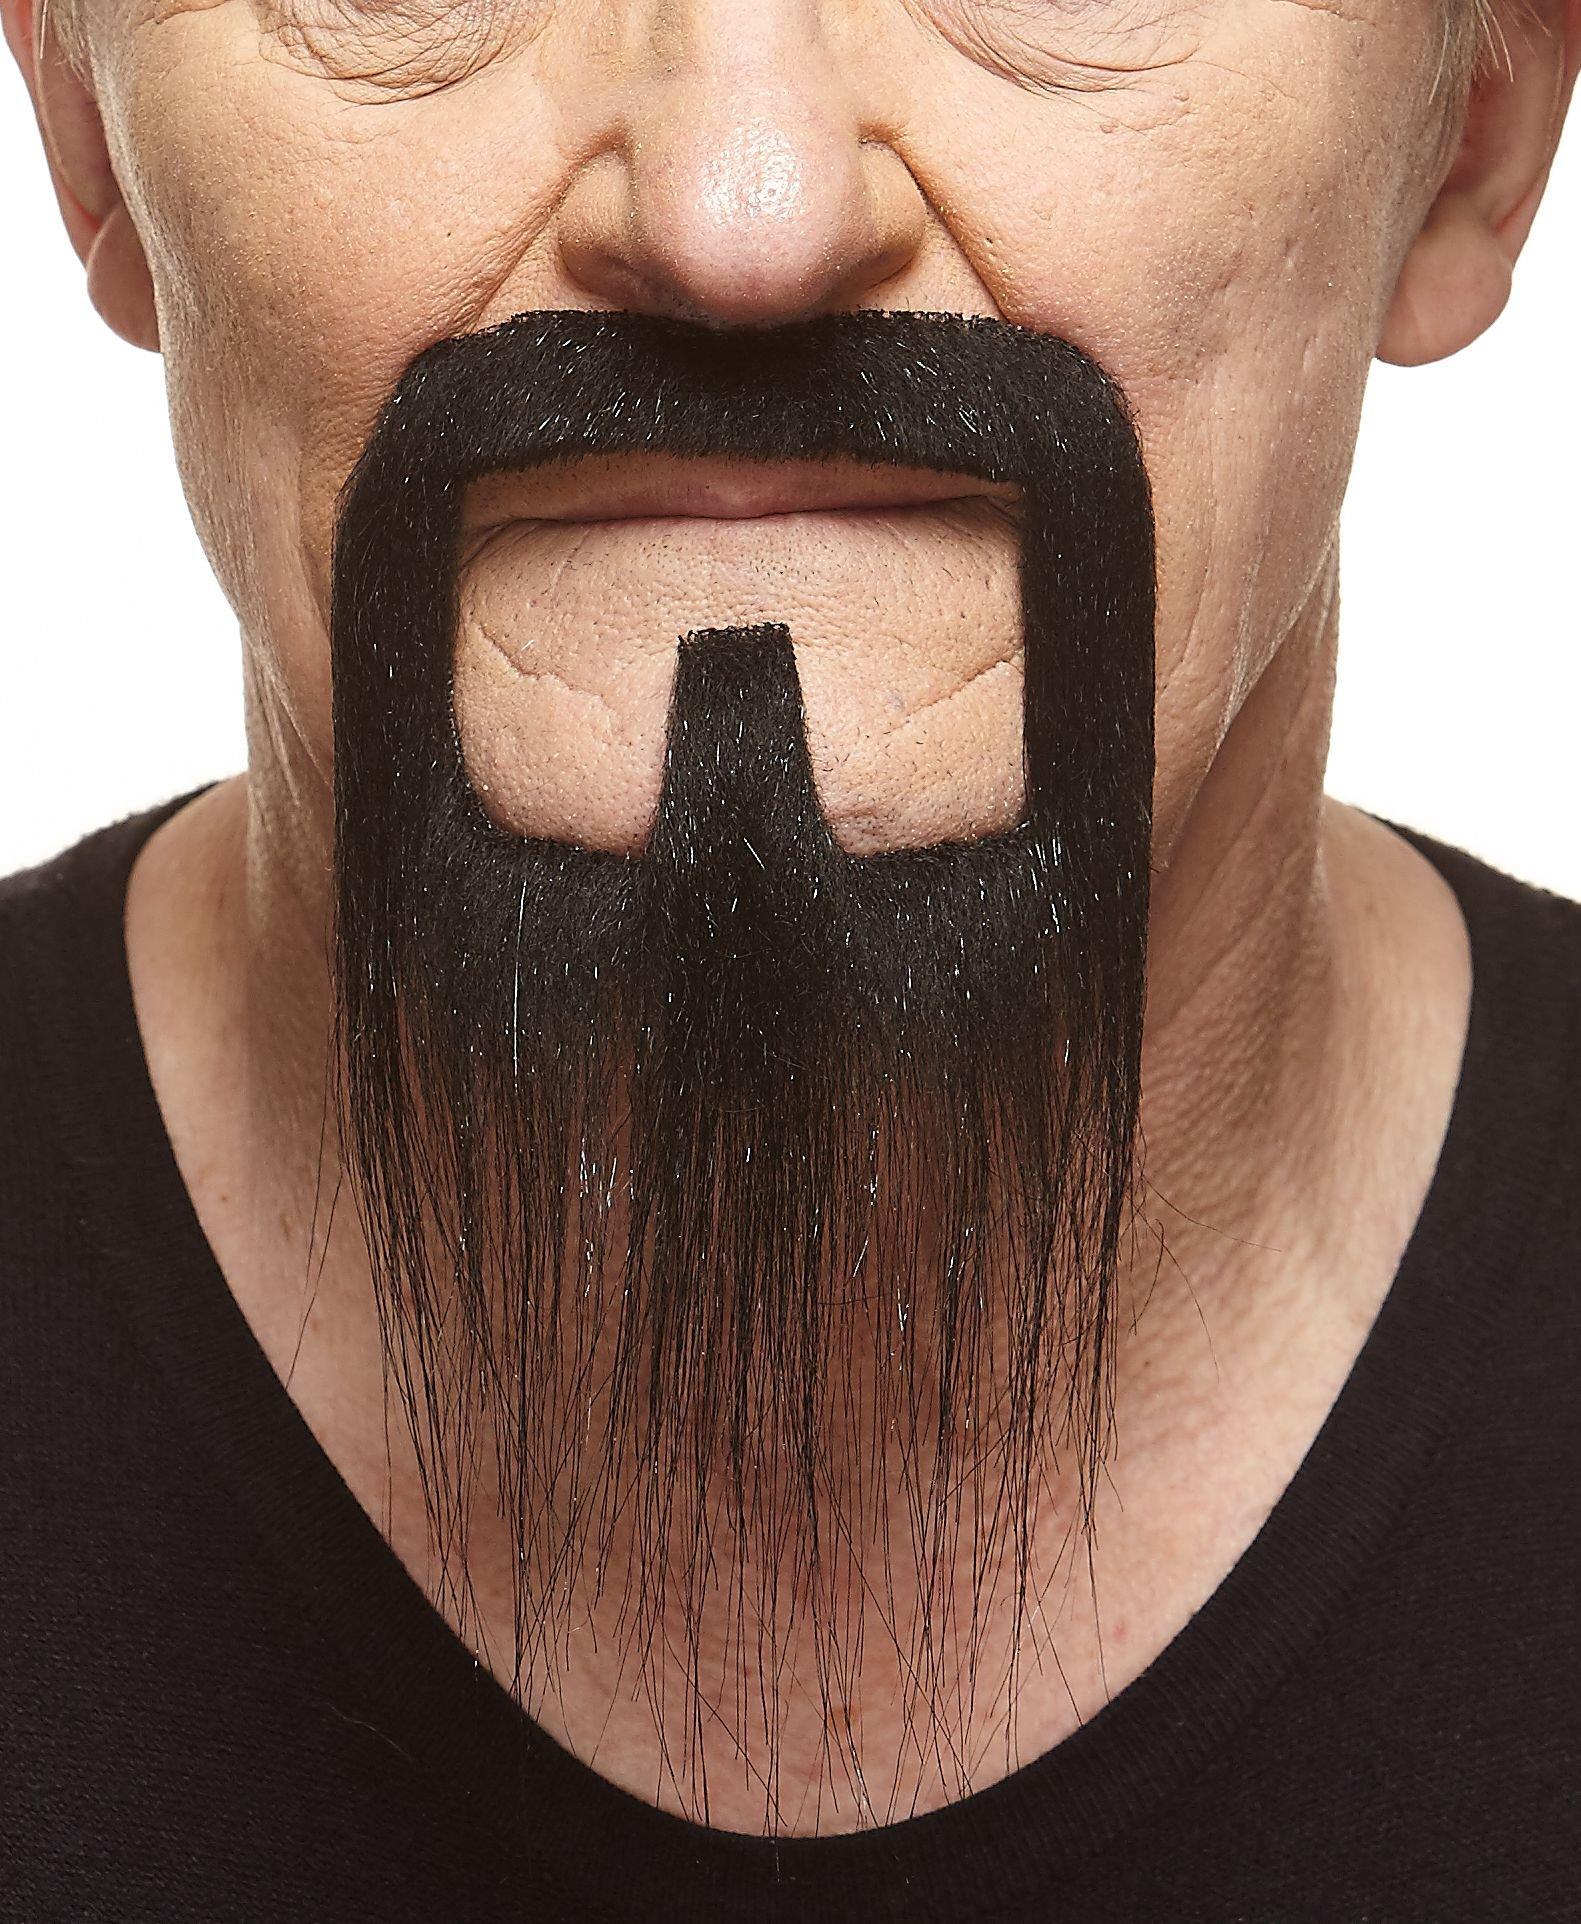 Mustaches Self Adhesive, Novelty, Long Van Dyke Fake Beard, False Facial Hair, Costume Accessory for Adults, Black Color